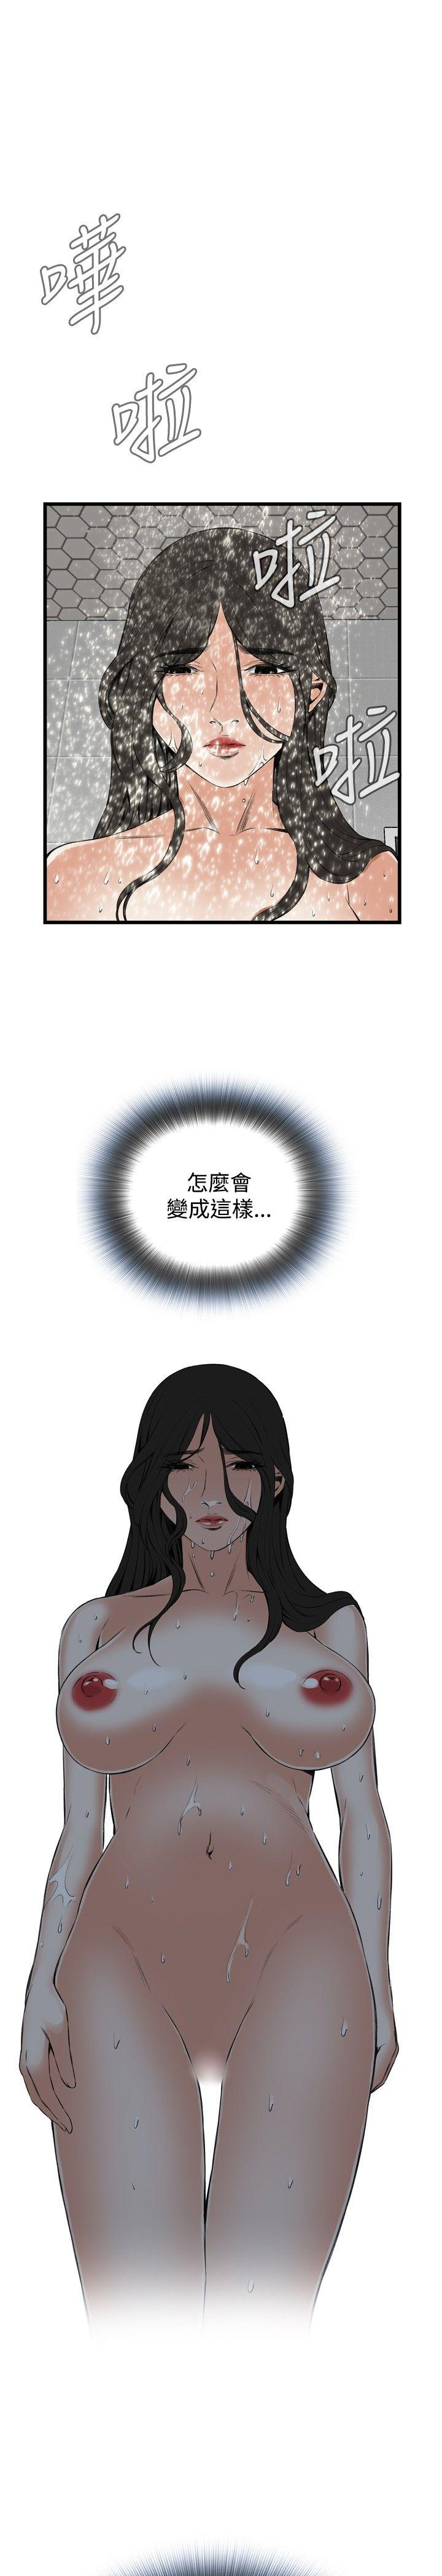 Take a Peek 偷窥 Ch.39~60 [Chinese]中文 495